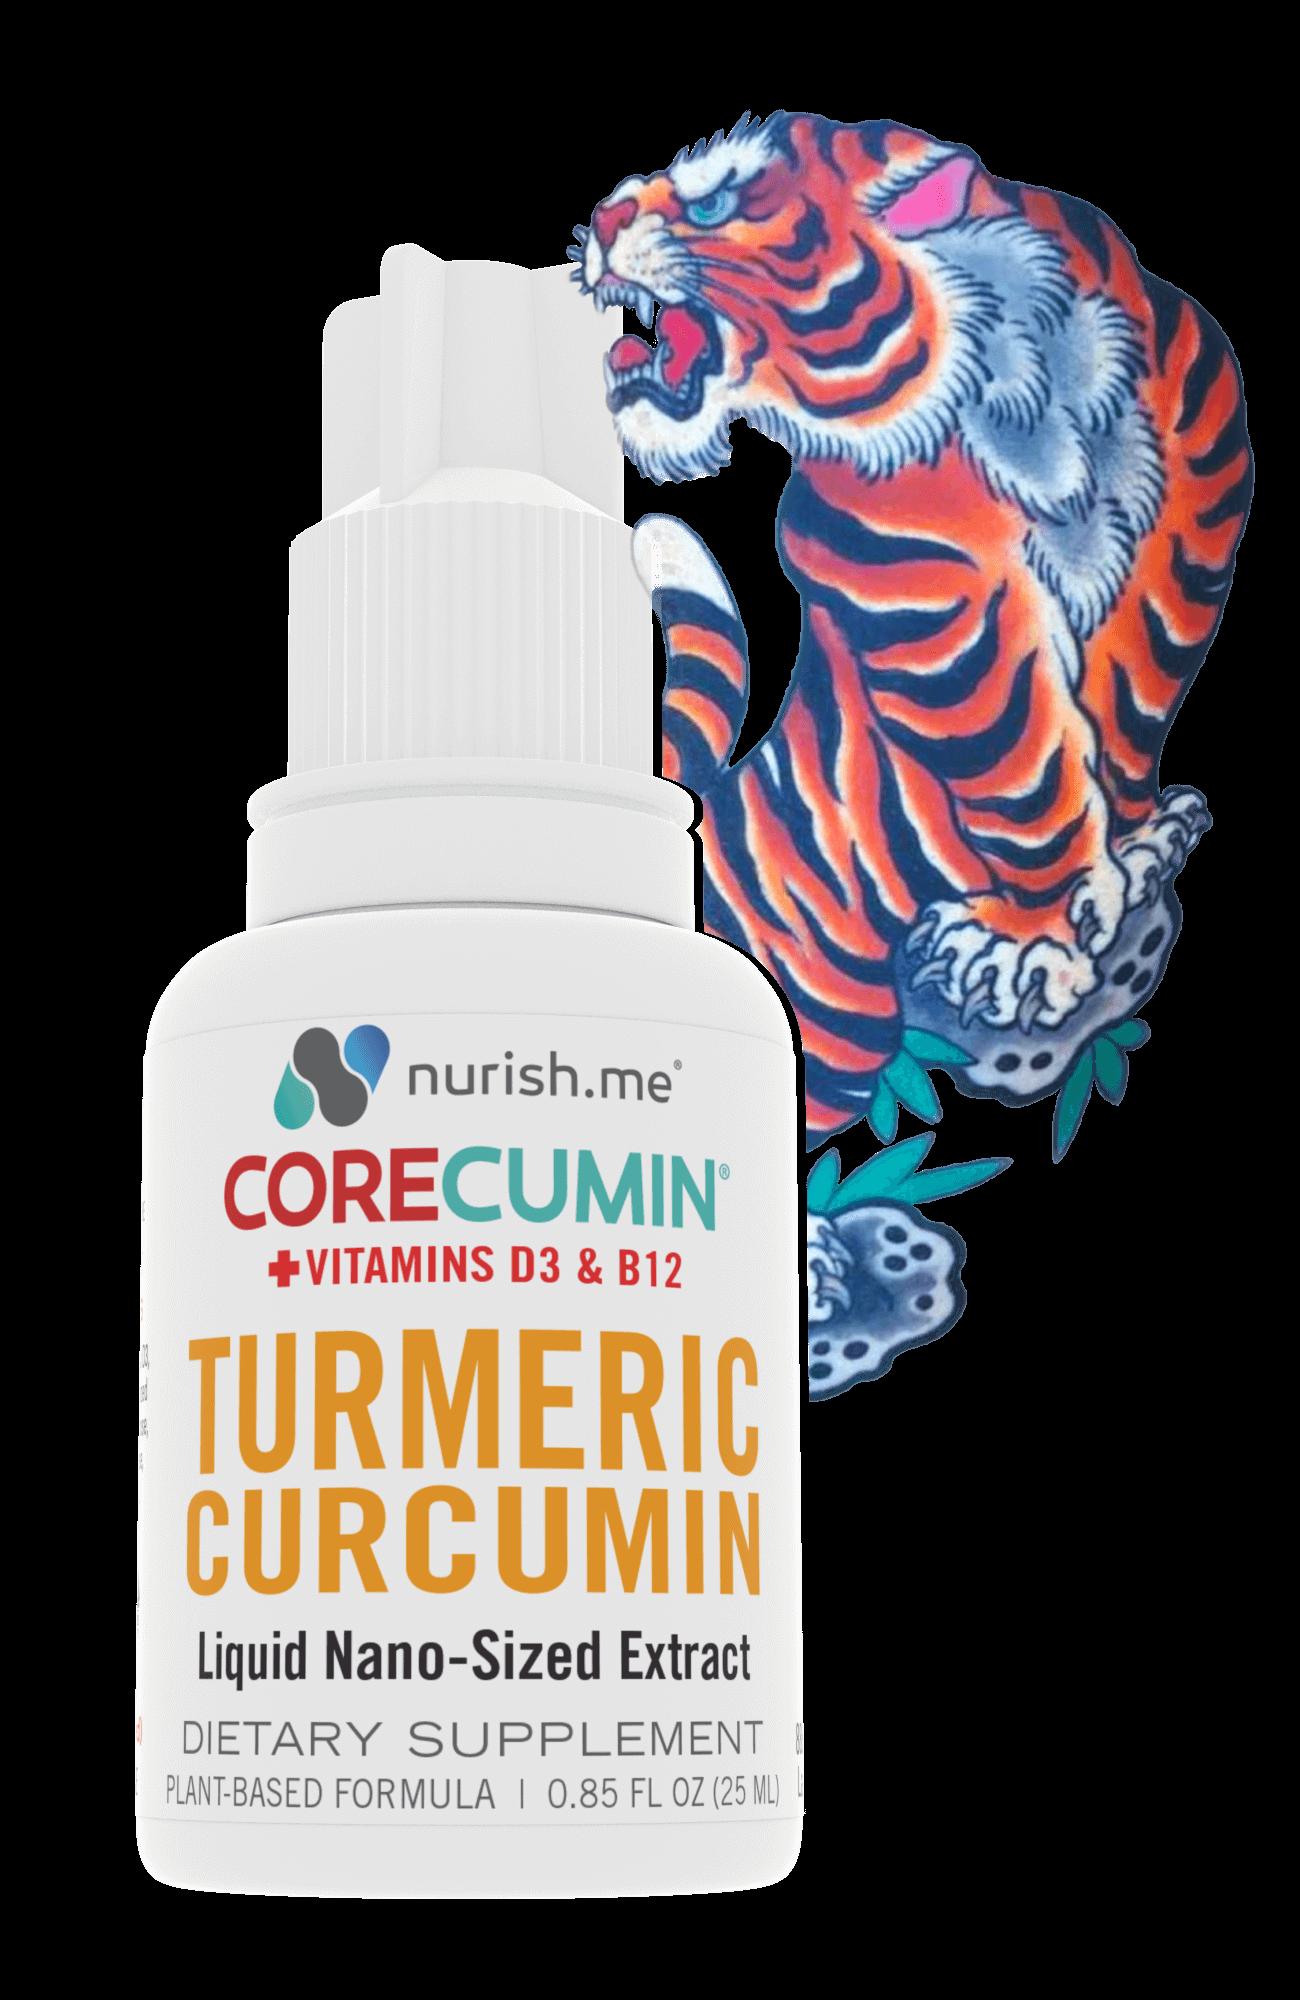 CoreCumin® Ami James Tiger Edition for Healthier Tattoos